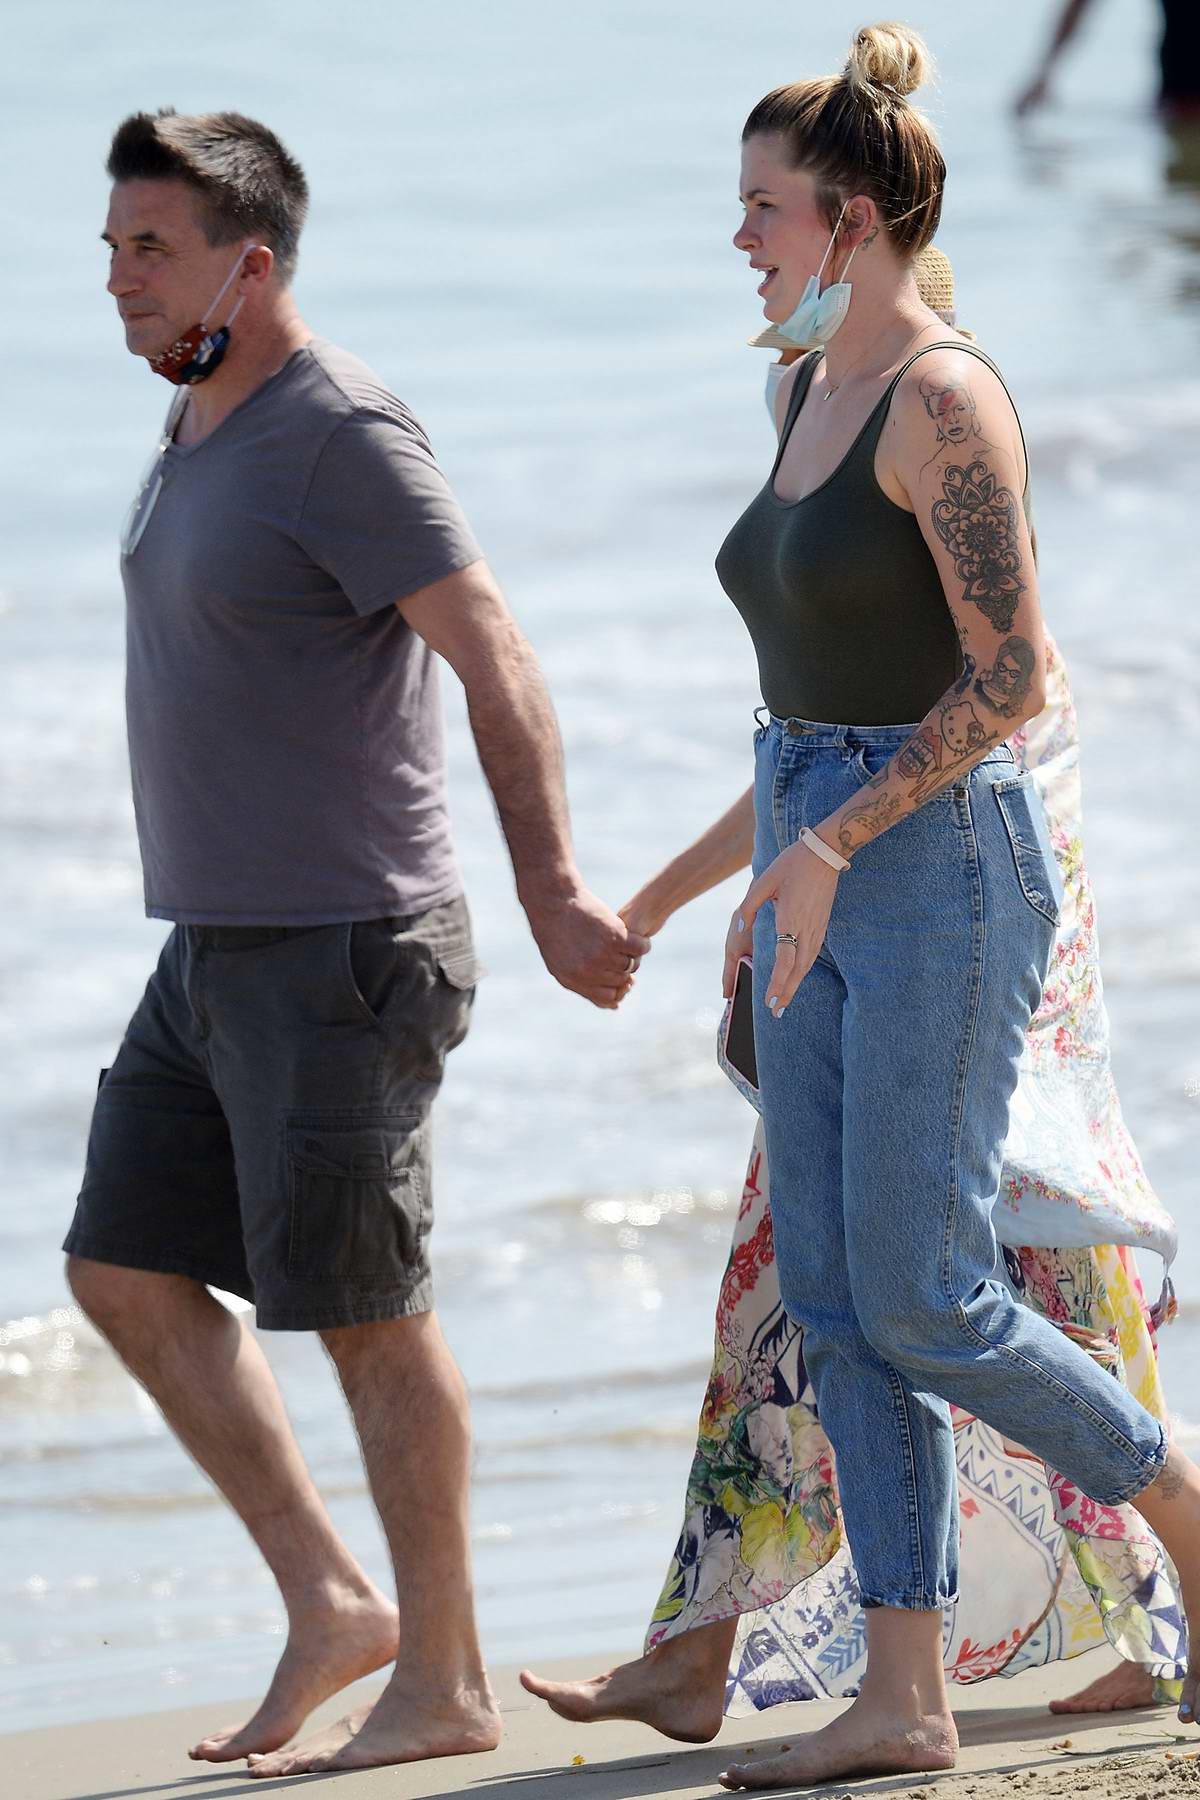 Ireland Baldwin and her uncle Stephen Baldwin cool off in the ocean in Malibu, California